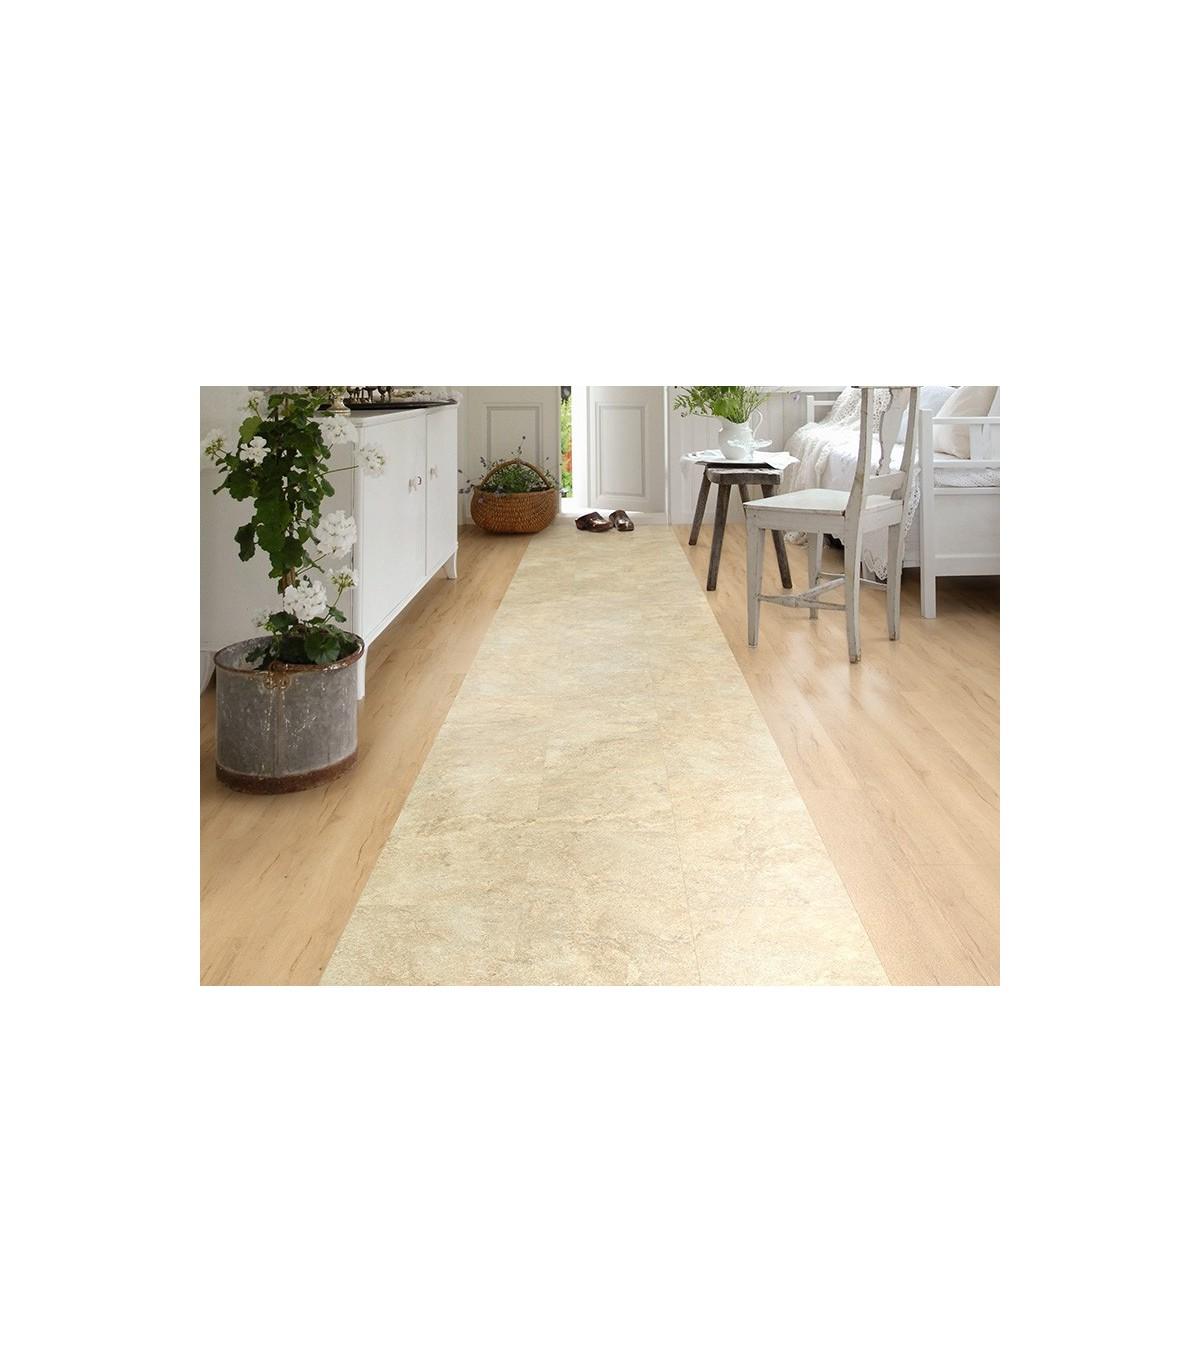 Pavimento Pvc Click Opinioni camaro loc stone - liuni - pavimento vinilico flottante